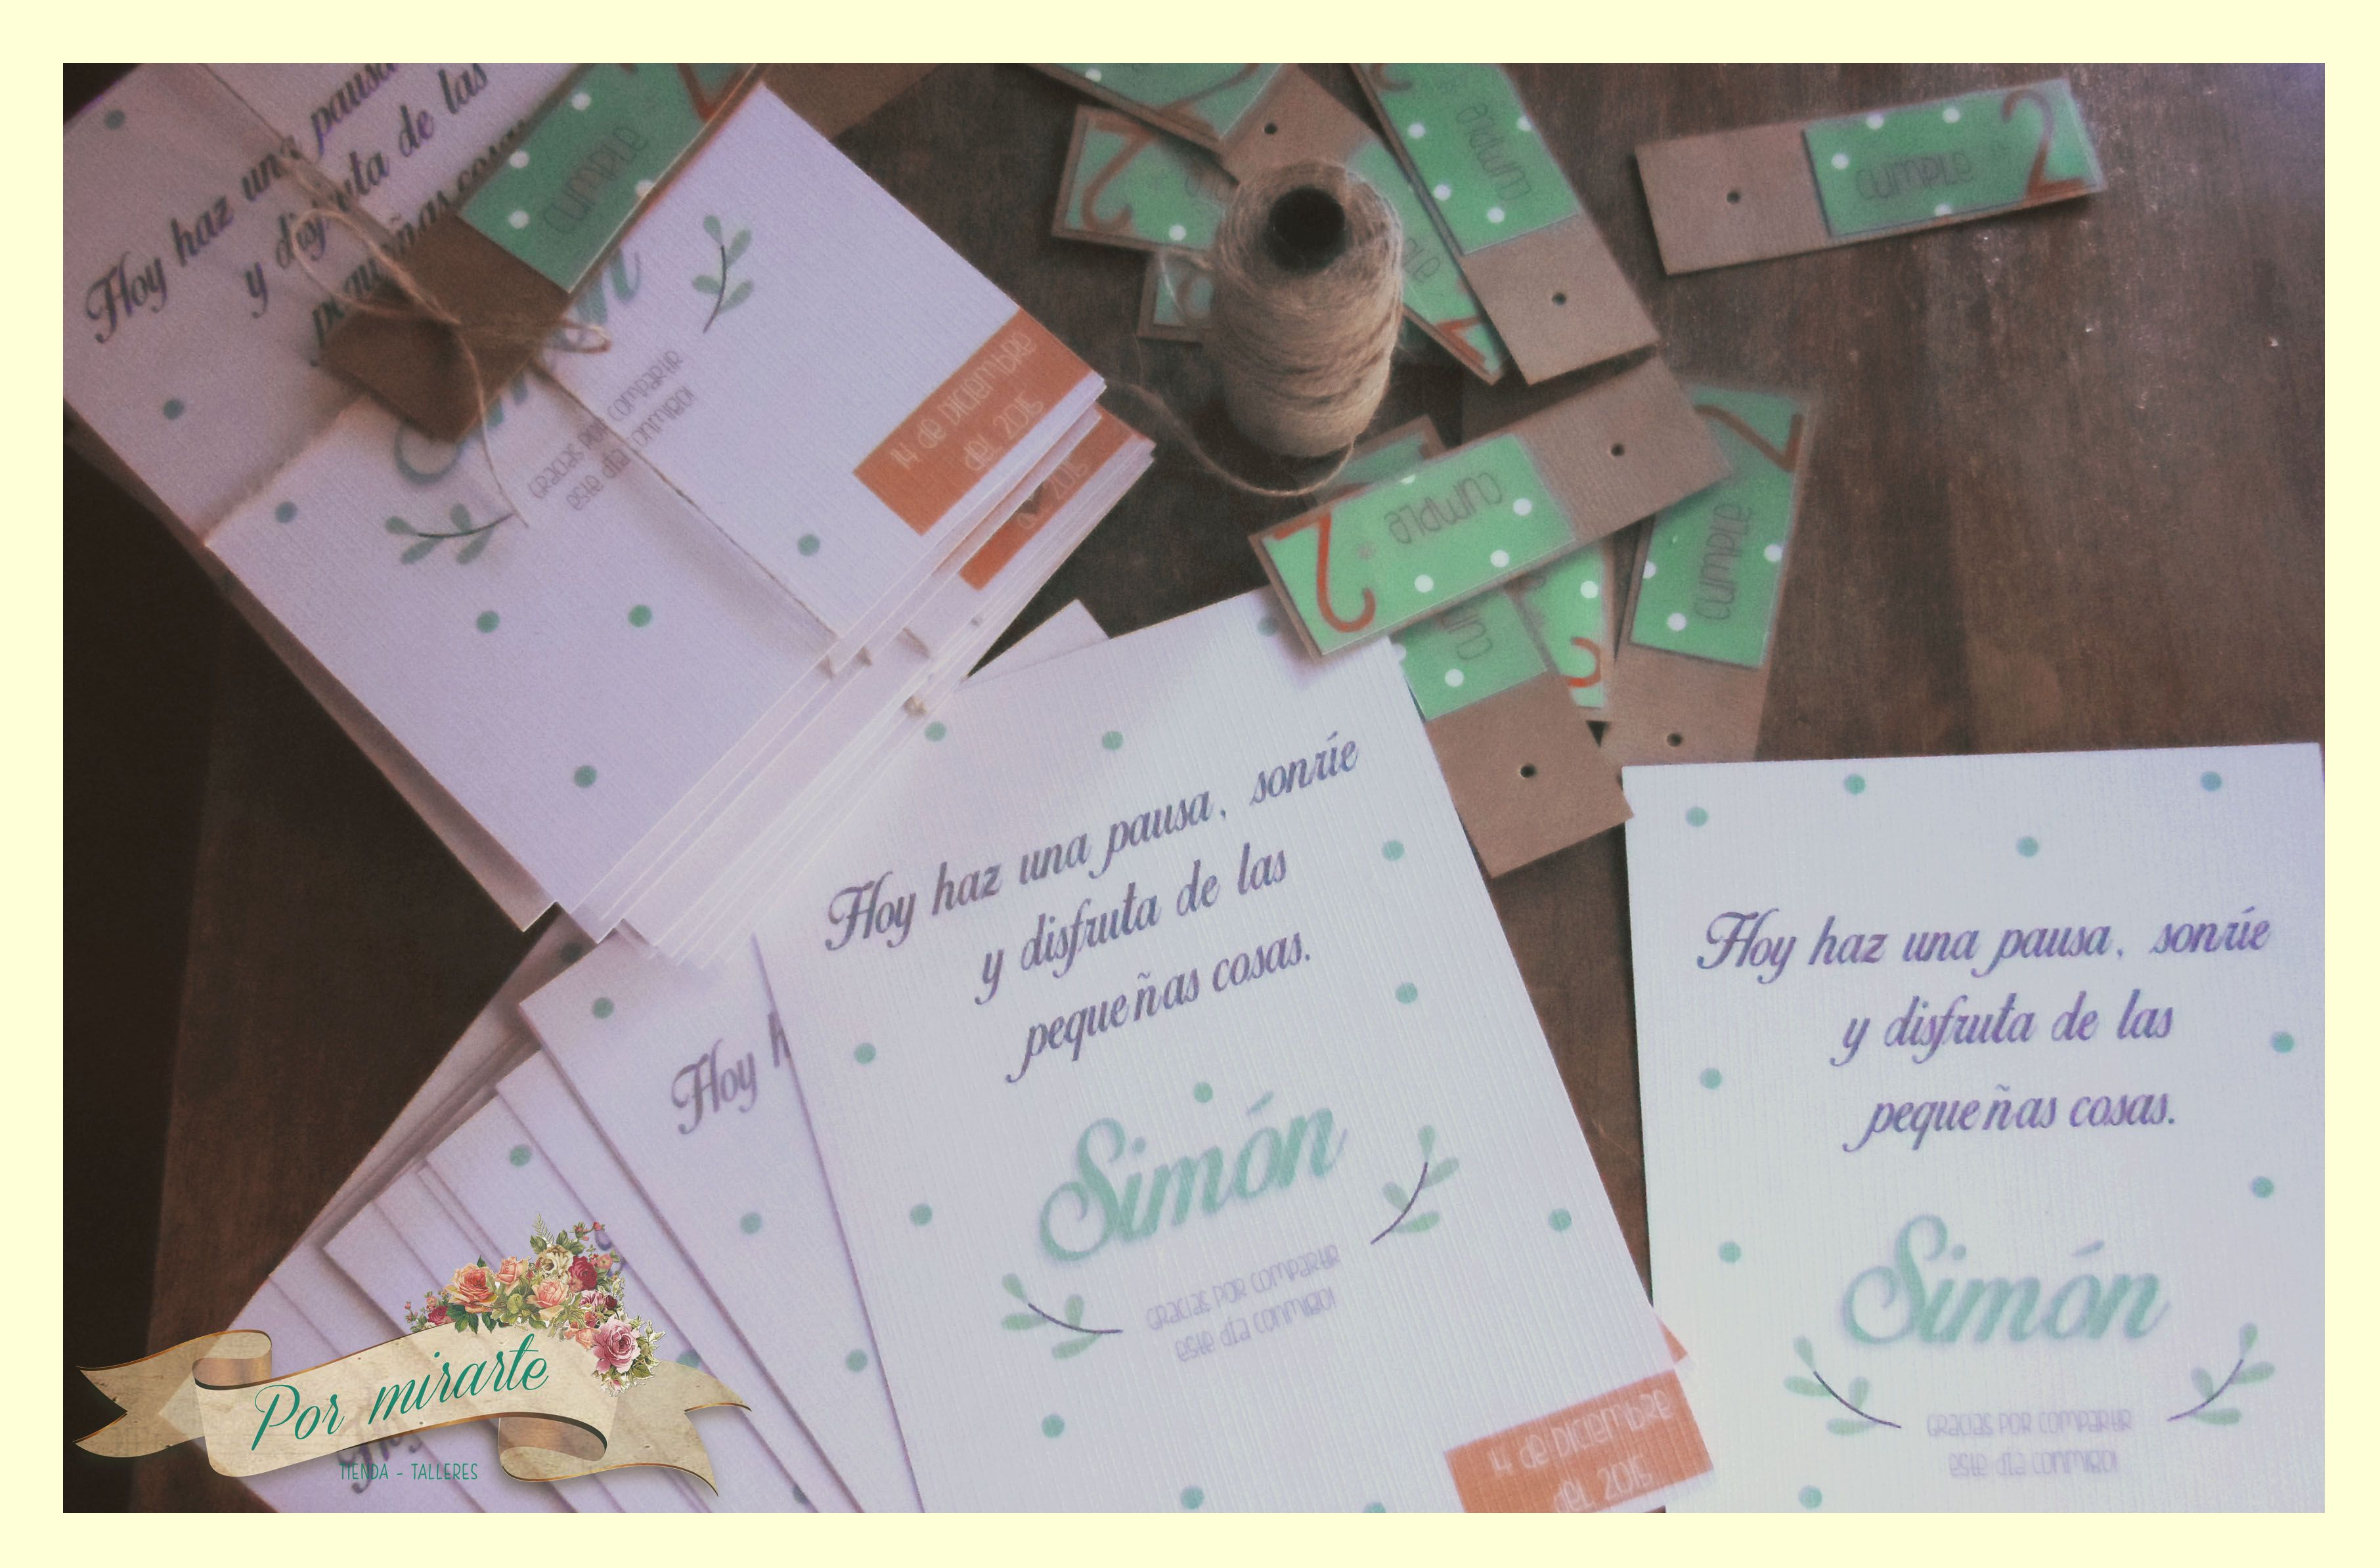 Souvenirs para el cumple de Simón - Tarjetones de recuerdo.